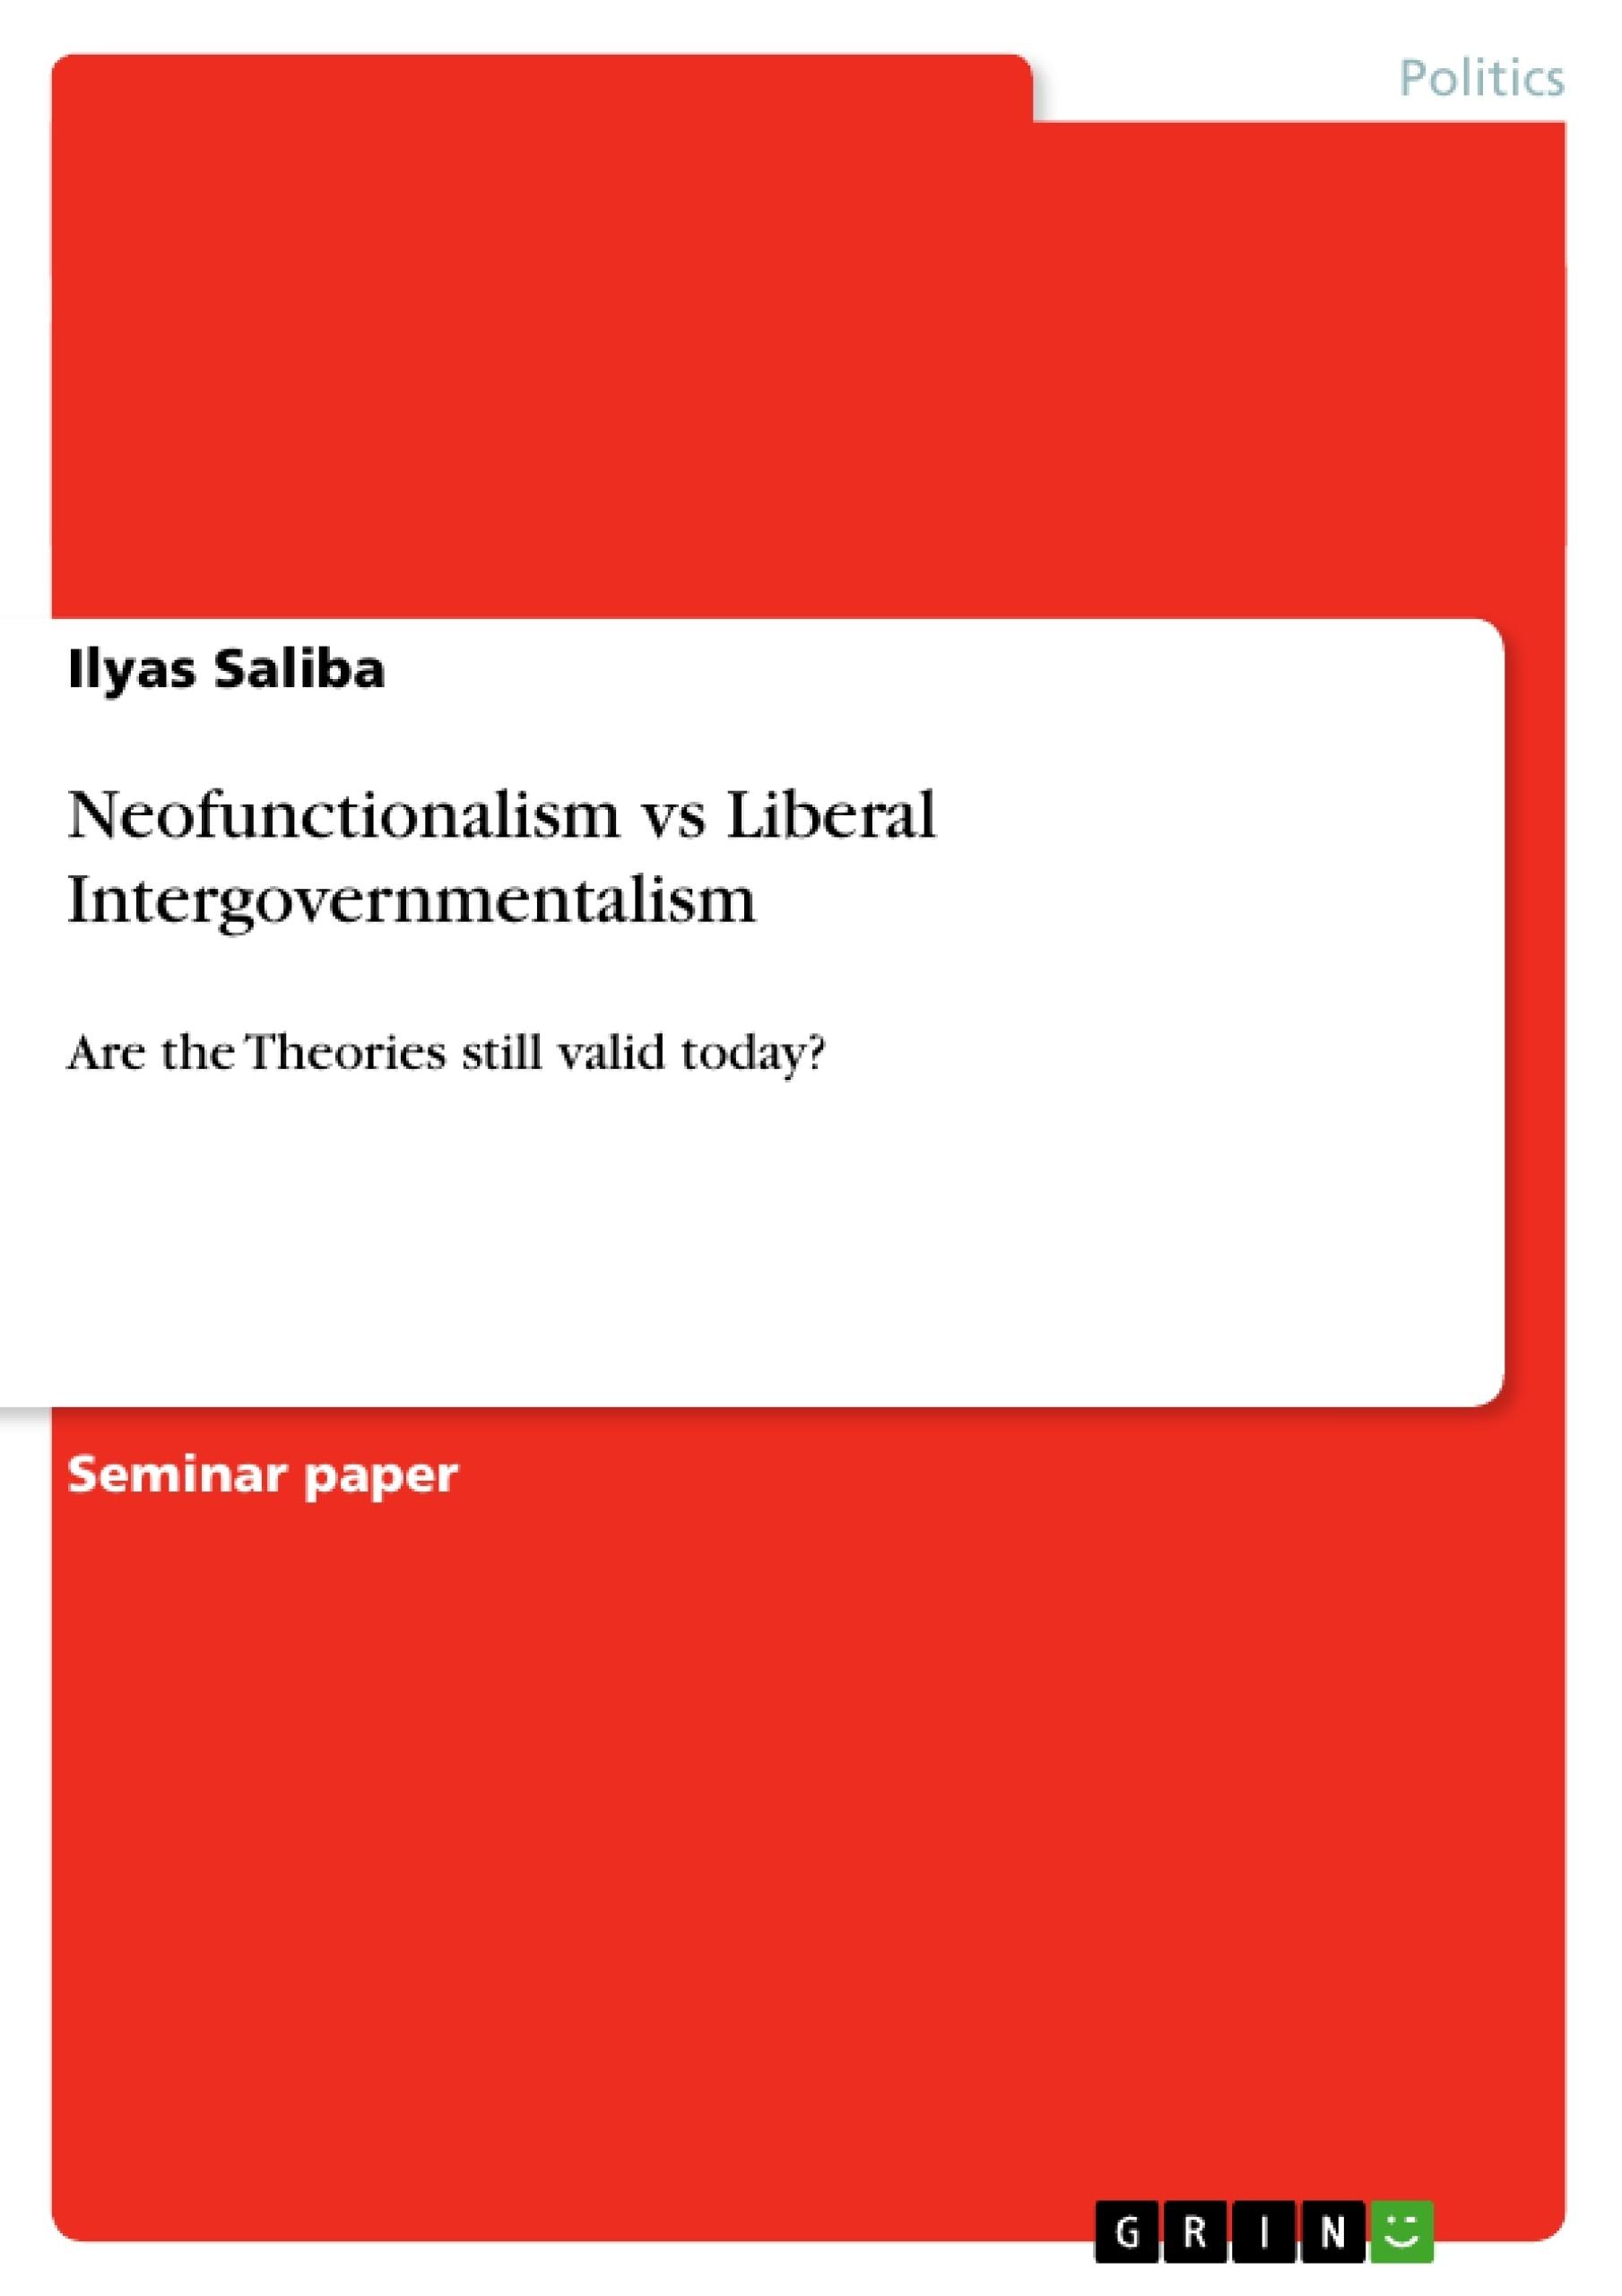 essay liberal intergovernmentalism